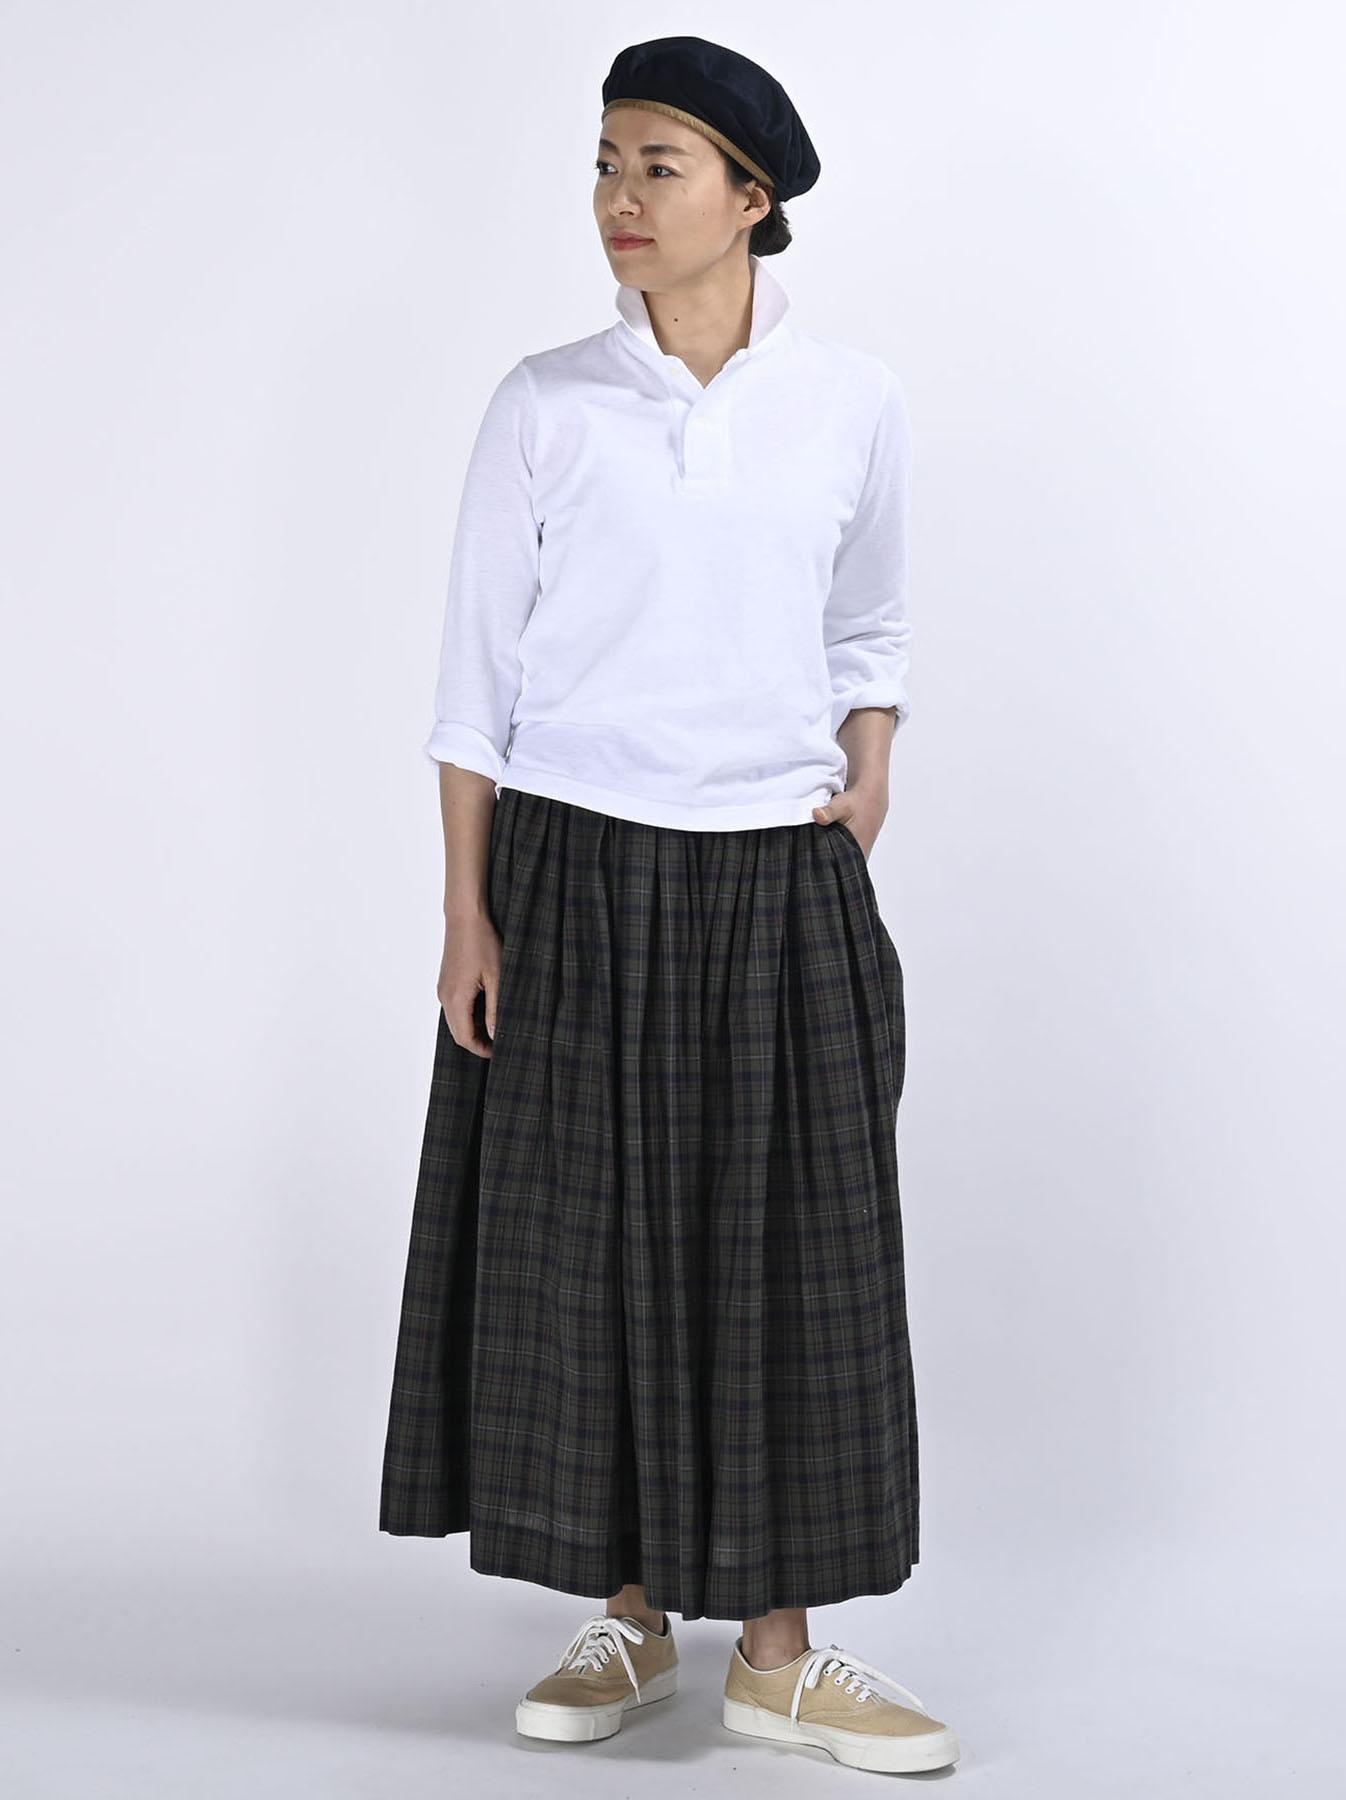 Kanoko Shiokaze Long-sleeved Square Polo Shirt (0521)-2